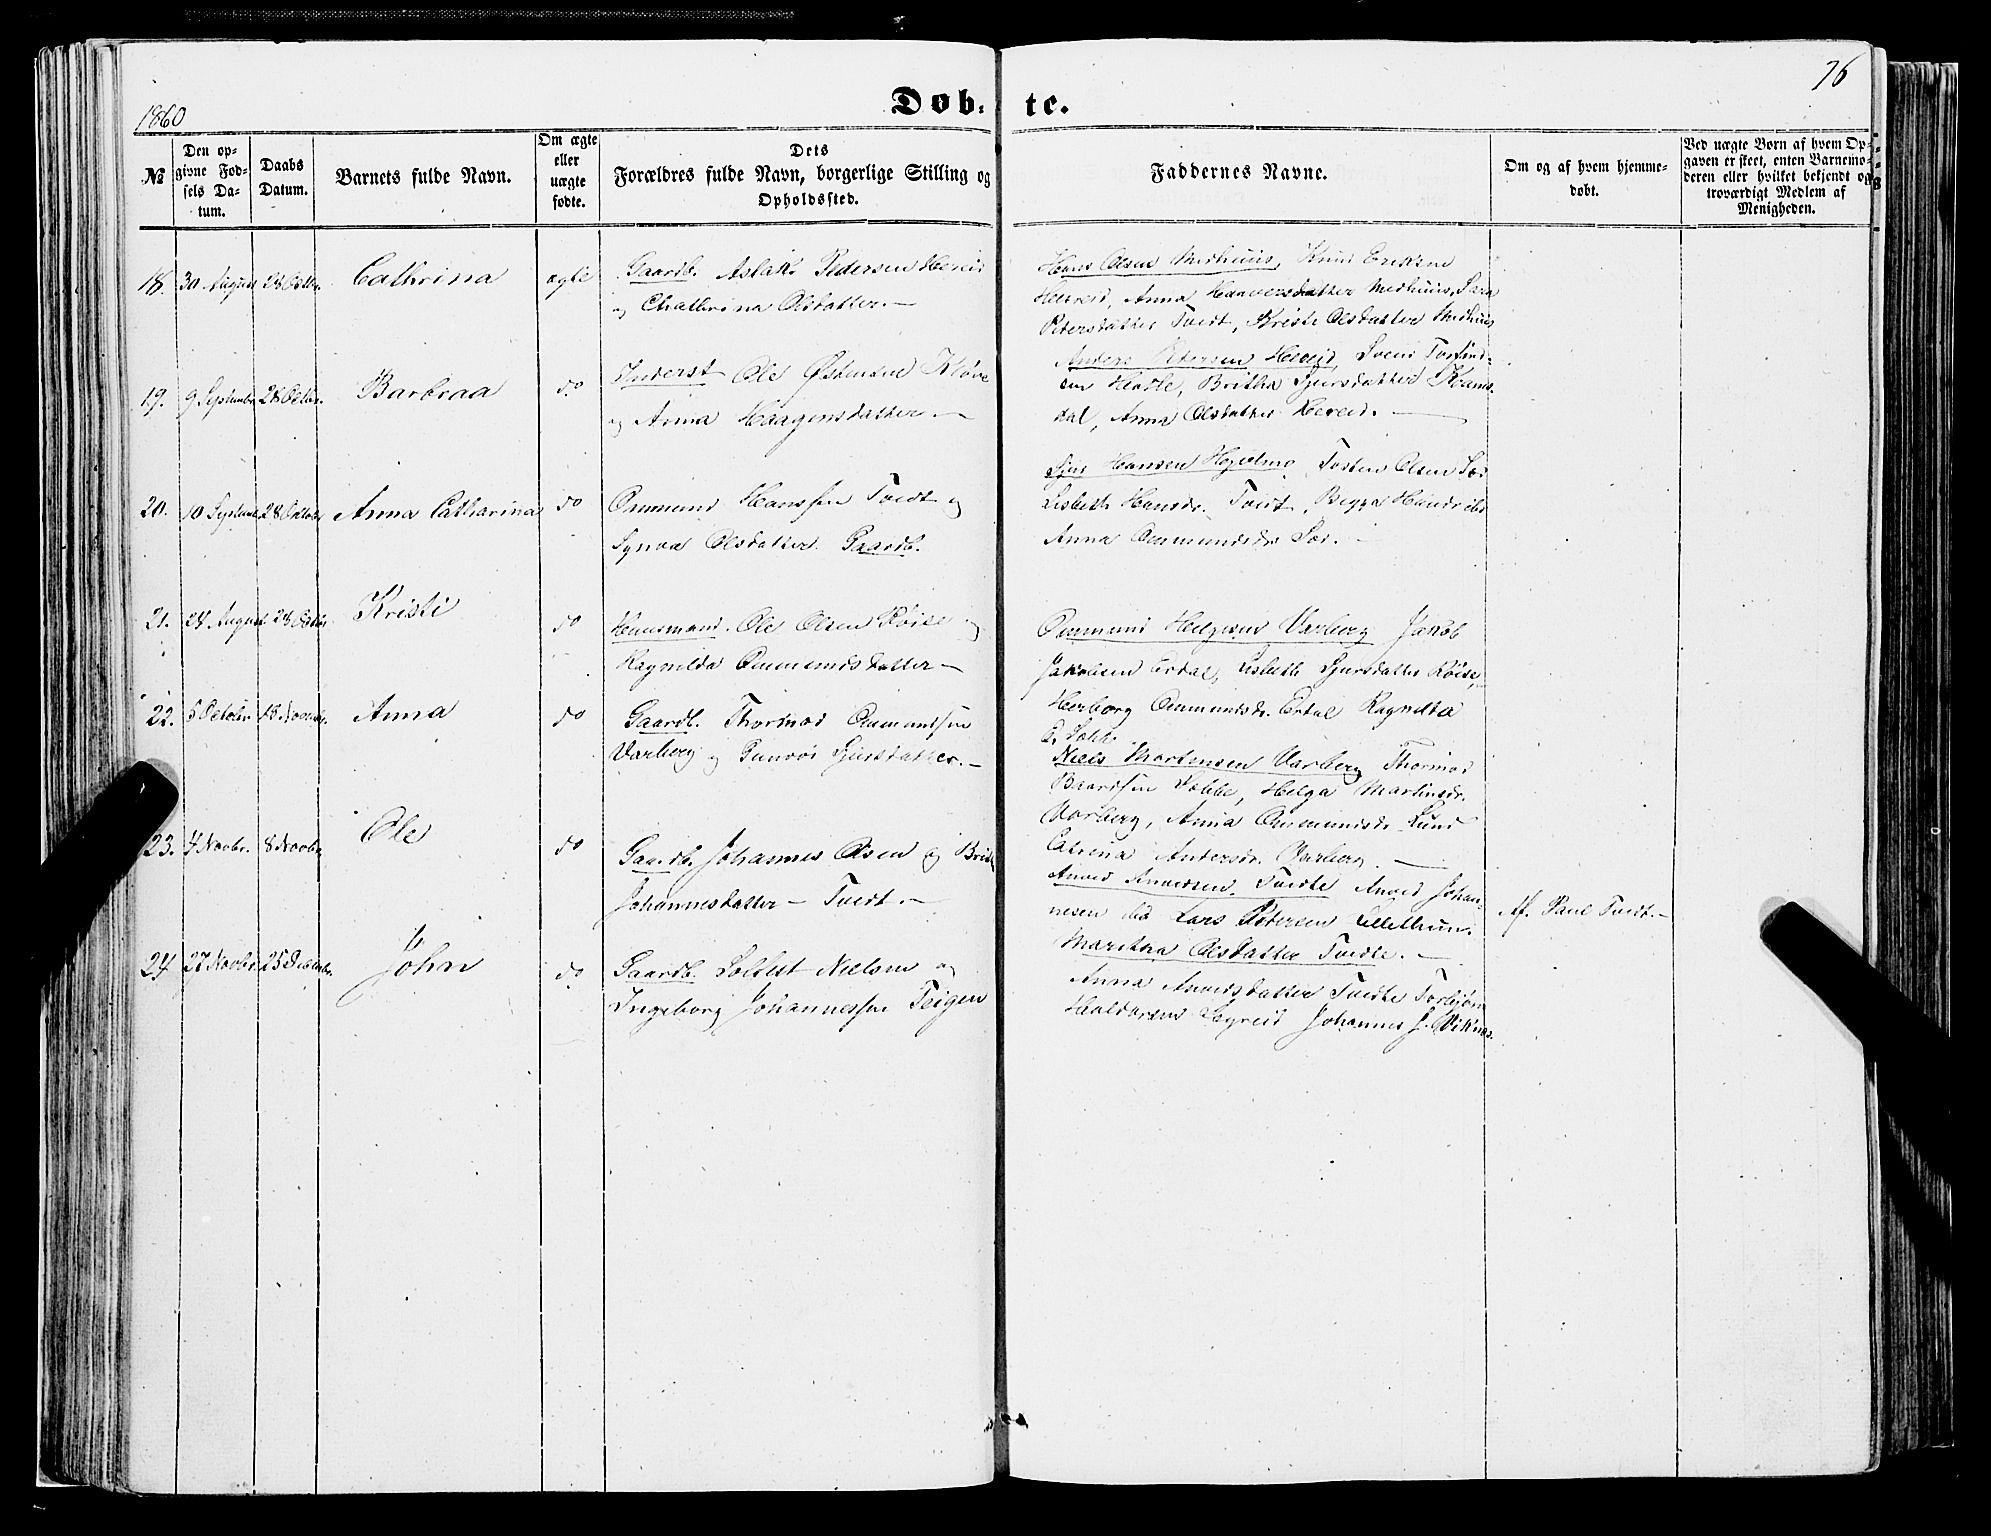 SAB, Ulvik sokneprestembete, H/Haa: Parish register (official) no. A 13, 1853-1863, p. 76